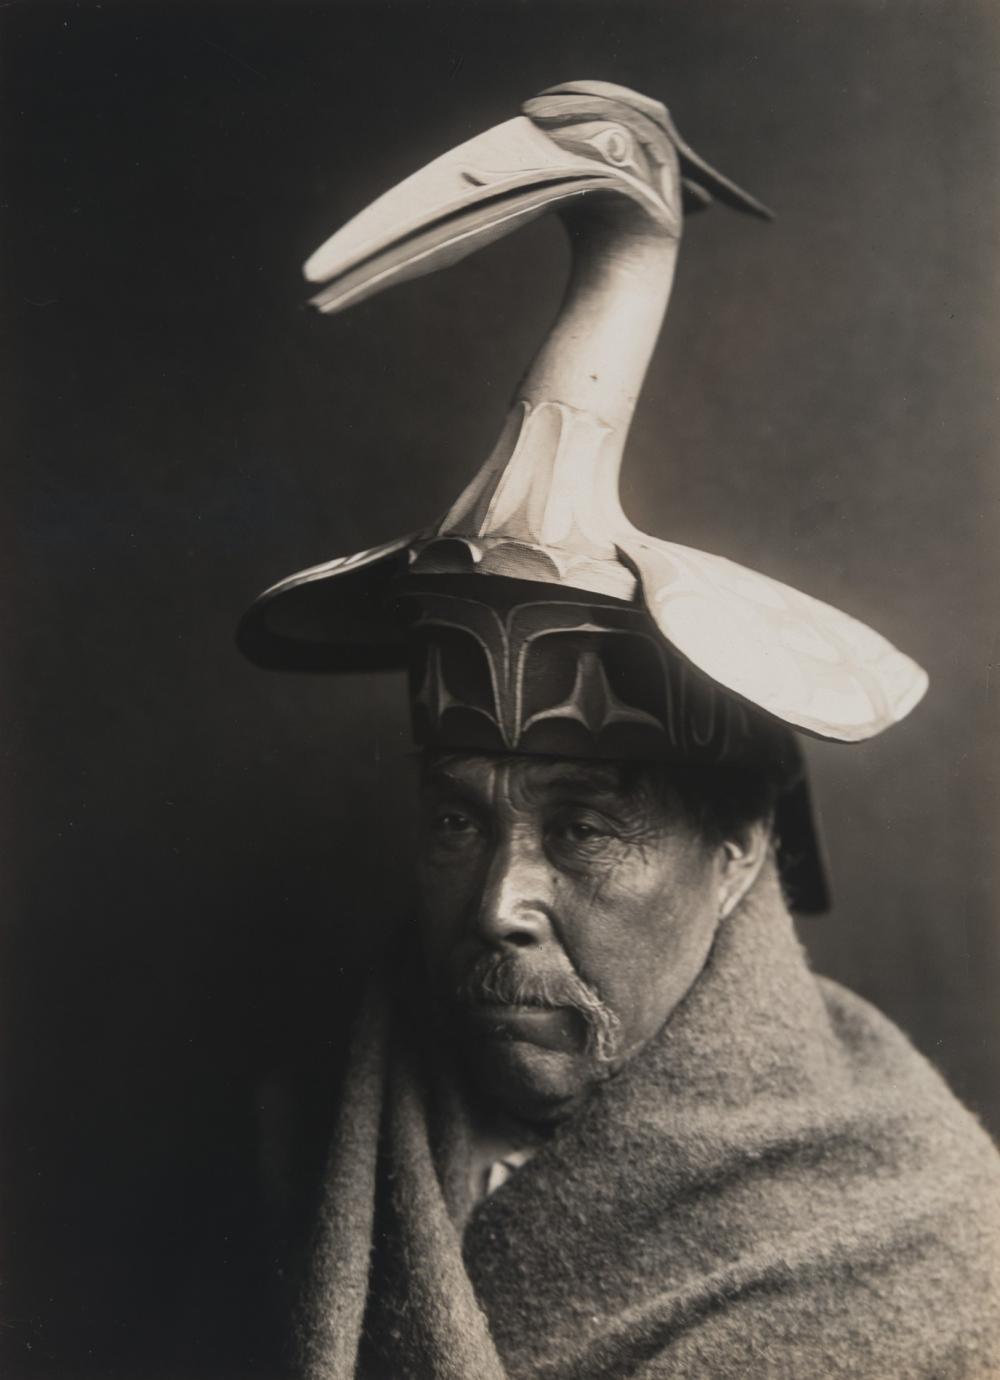 Edward S. Curtis, Untitled (Northwest Coast Man with Bird Headwear), ca. 1914